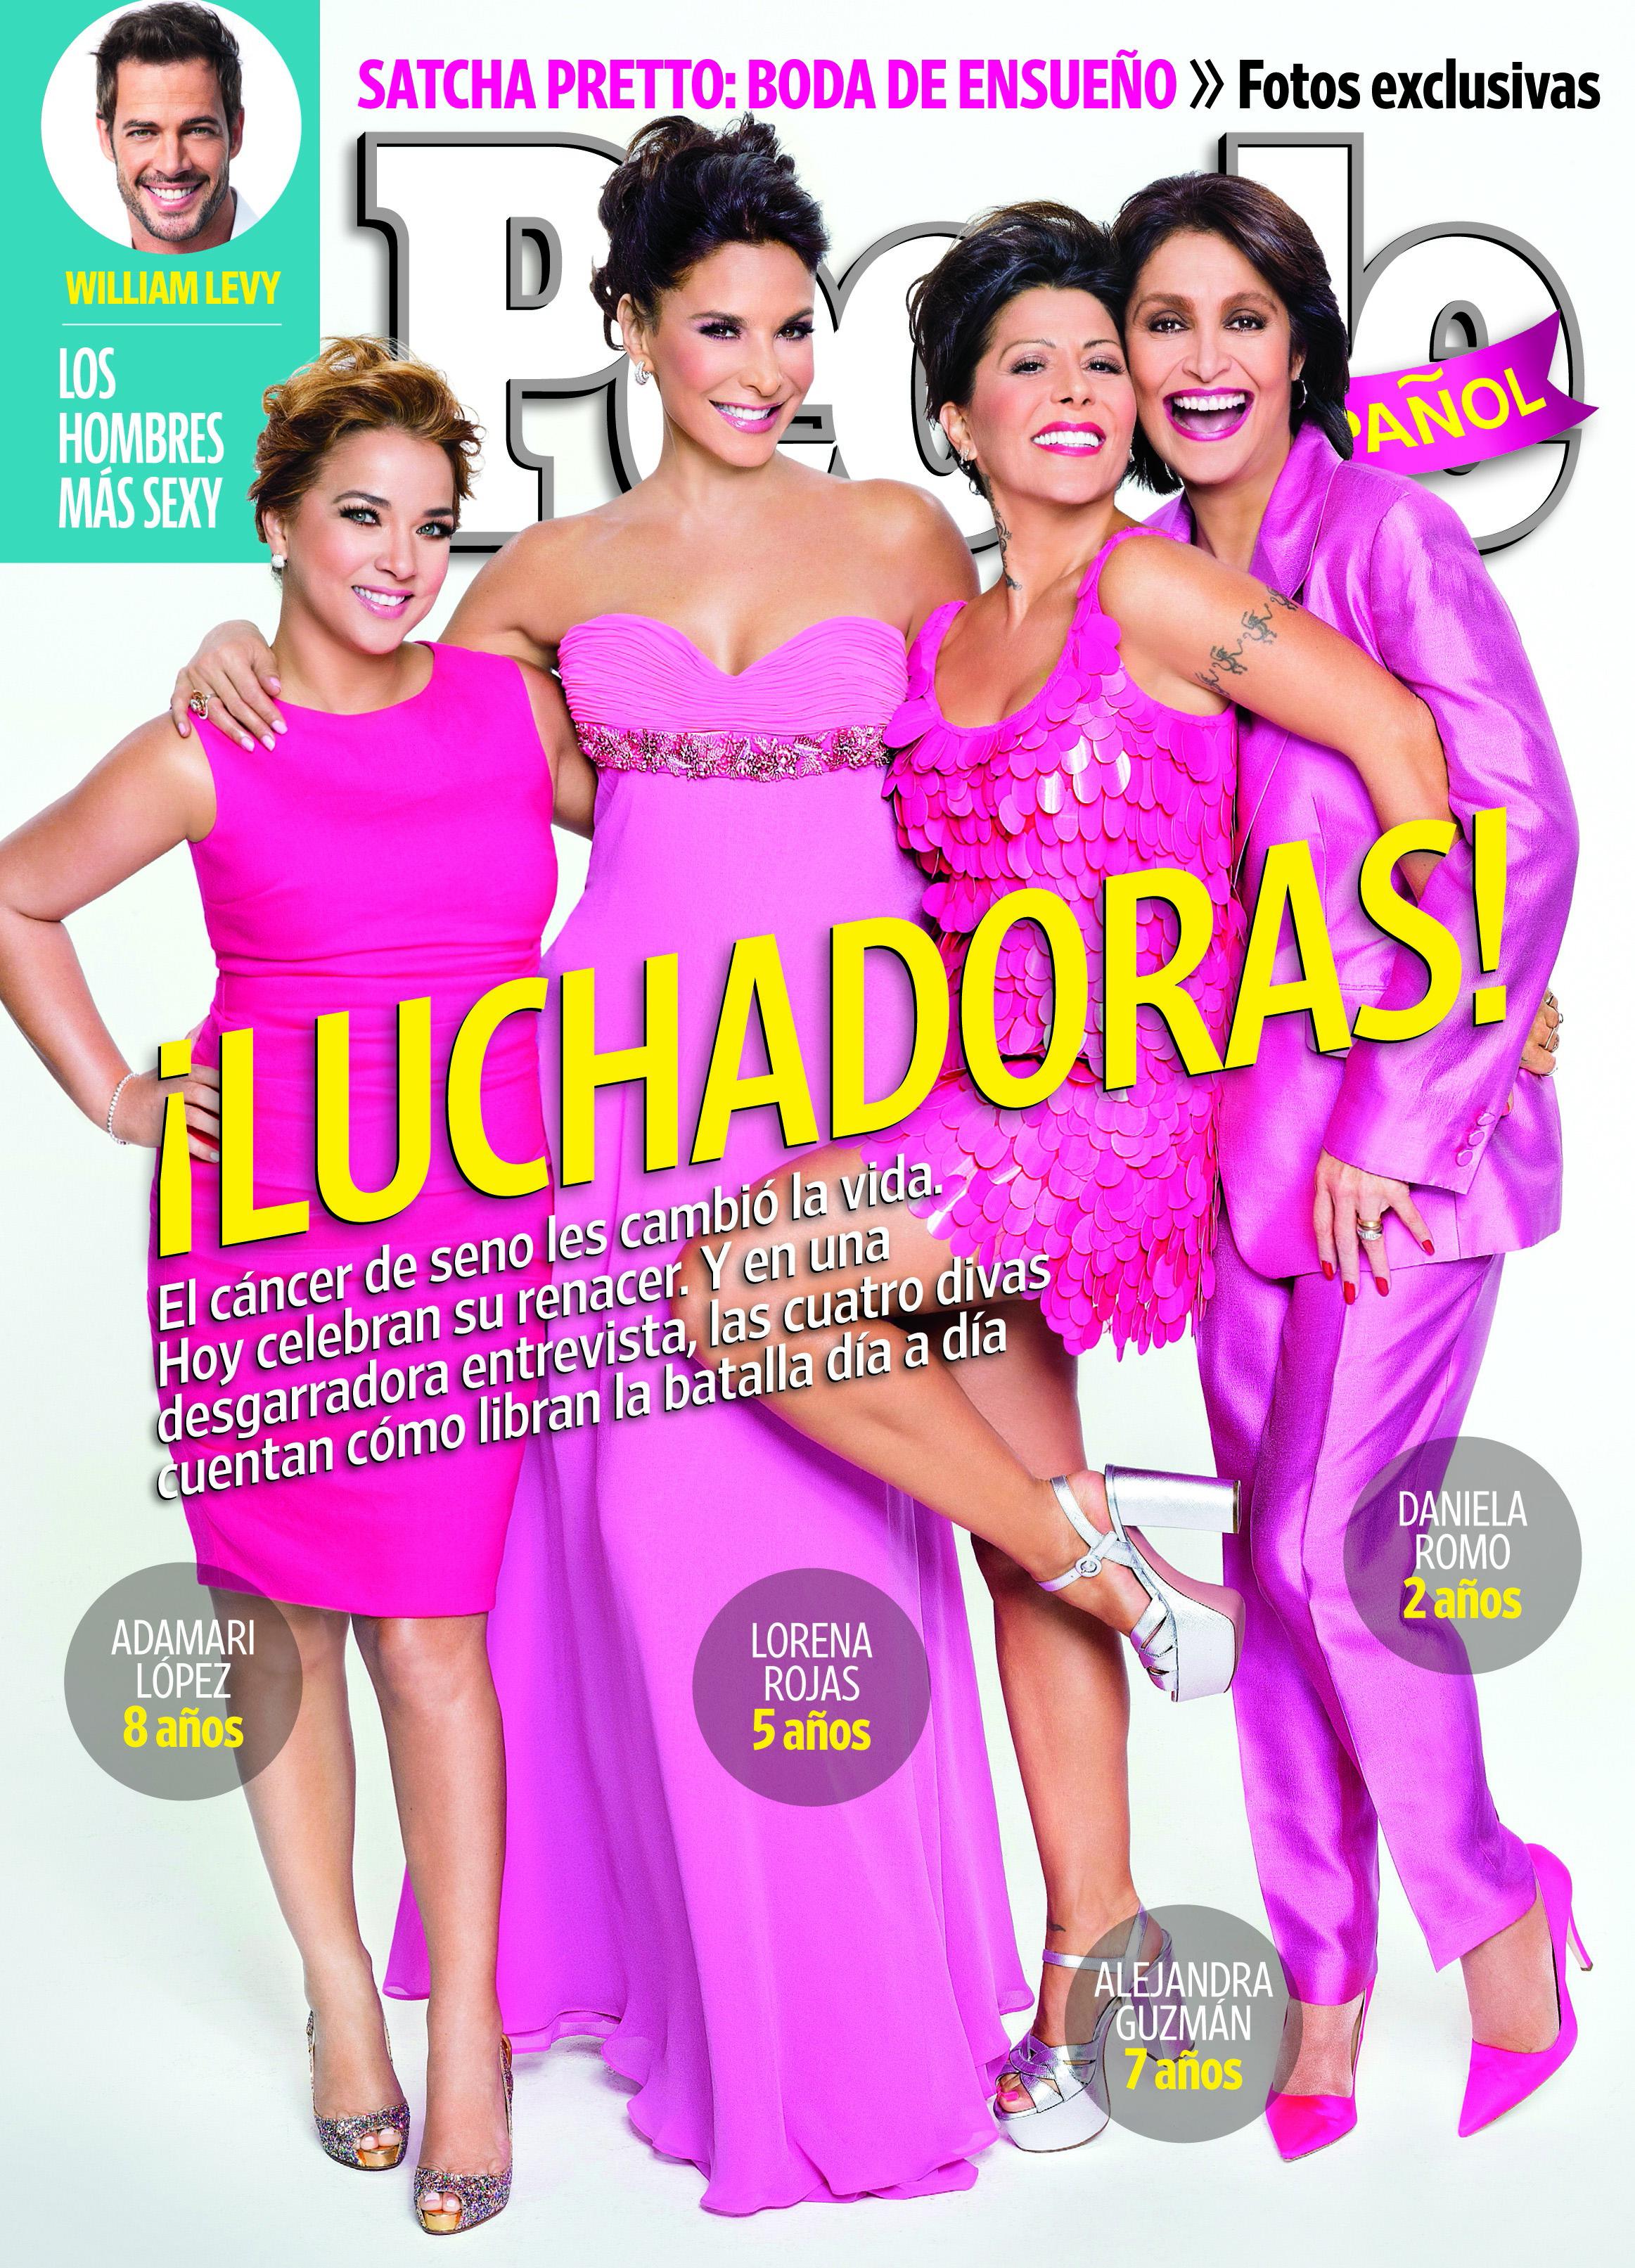 Adamari Lopez, Lorena Rojas, Alejandra Guzman, Daniela Romo - October 2013